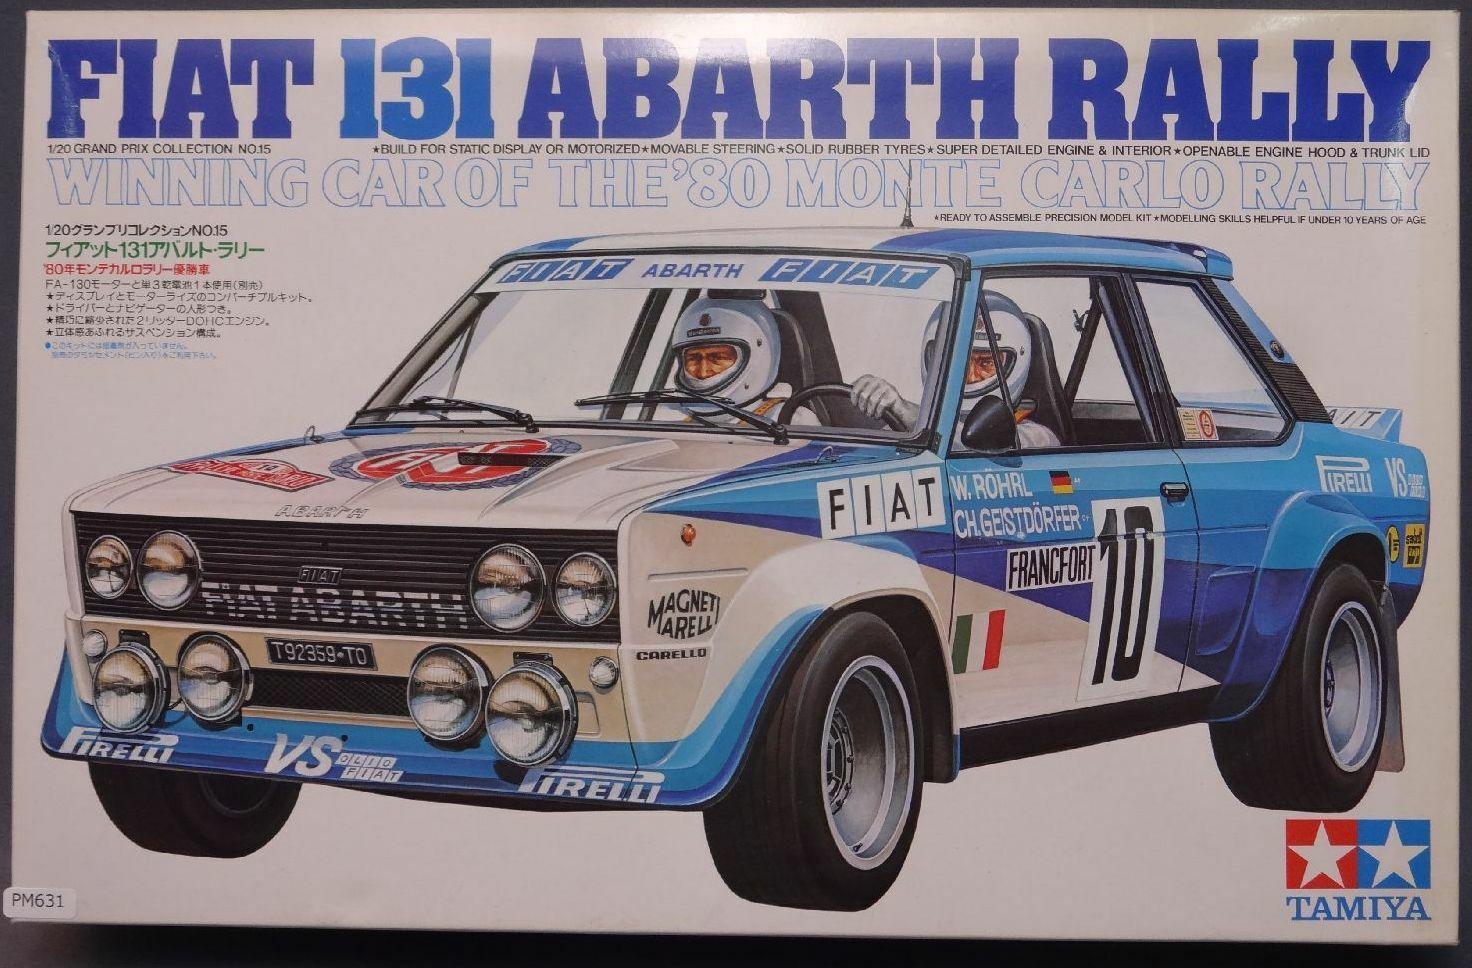 1   20 - skala tamiya fiat 131 abarth rallye - auto rohrstabilisierungseinheit display pm631